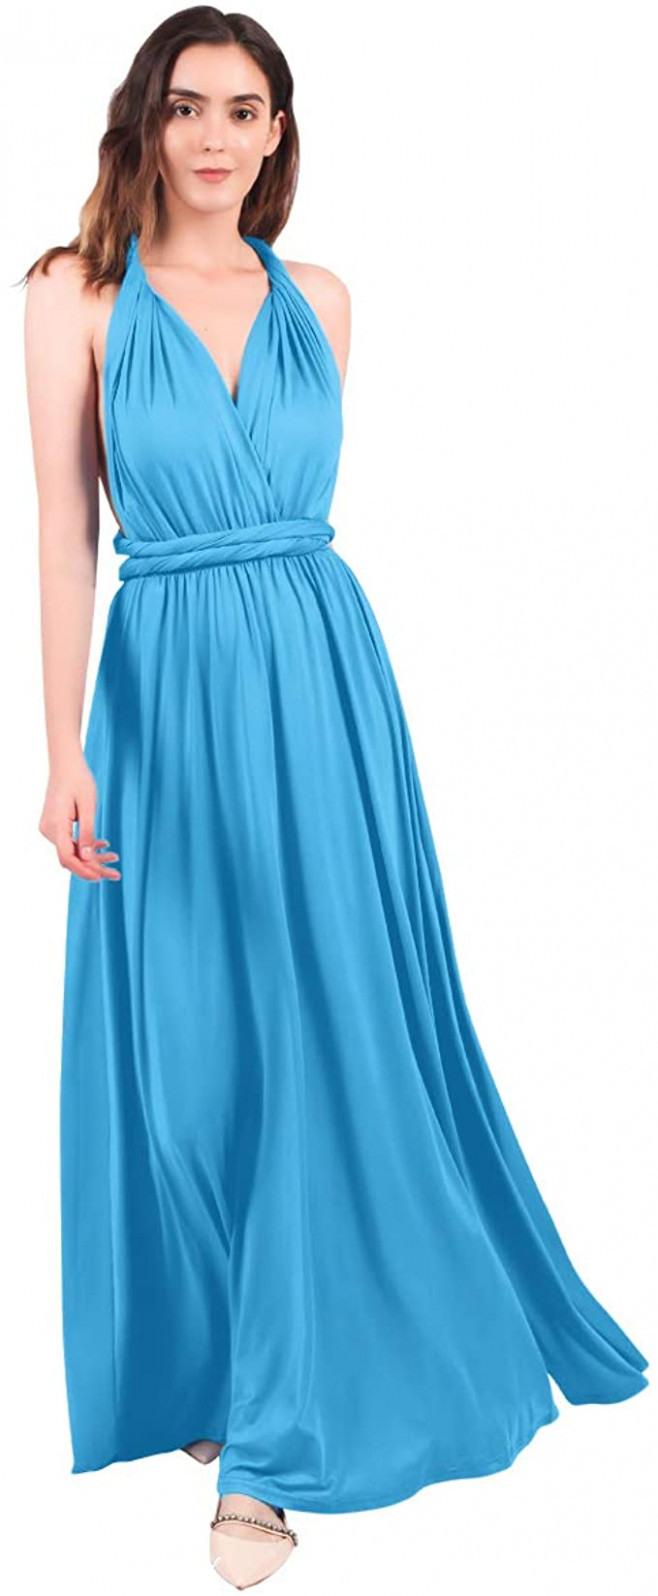 Abendkleid Wickelkleid  Abendkleider